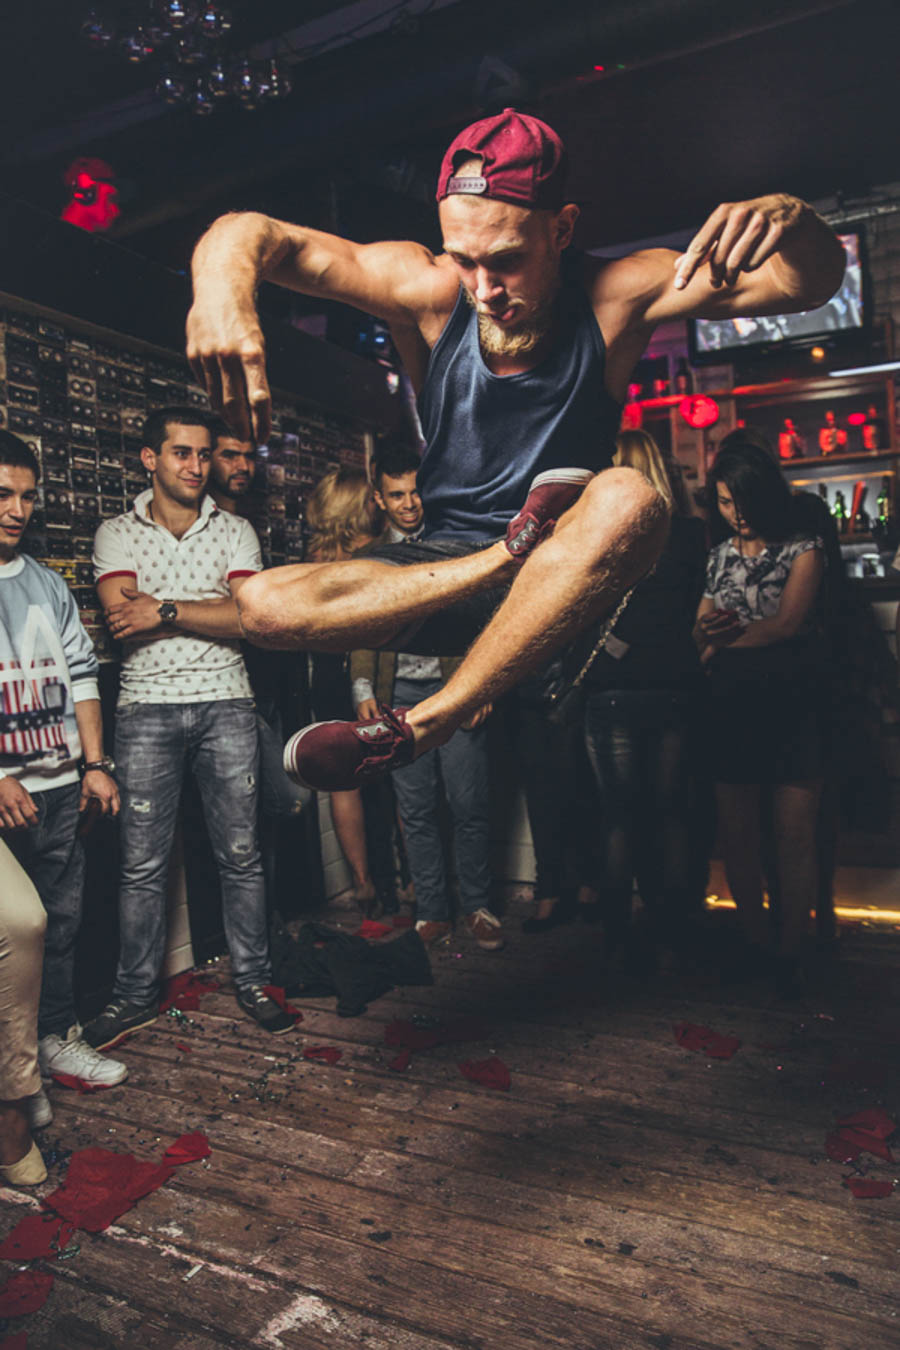 Nightlife one Nightclub by Denis Filatov